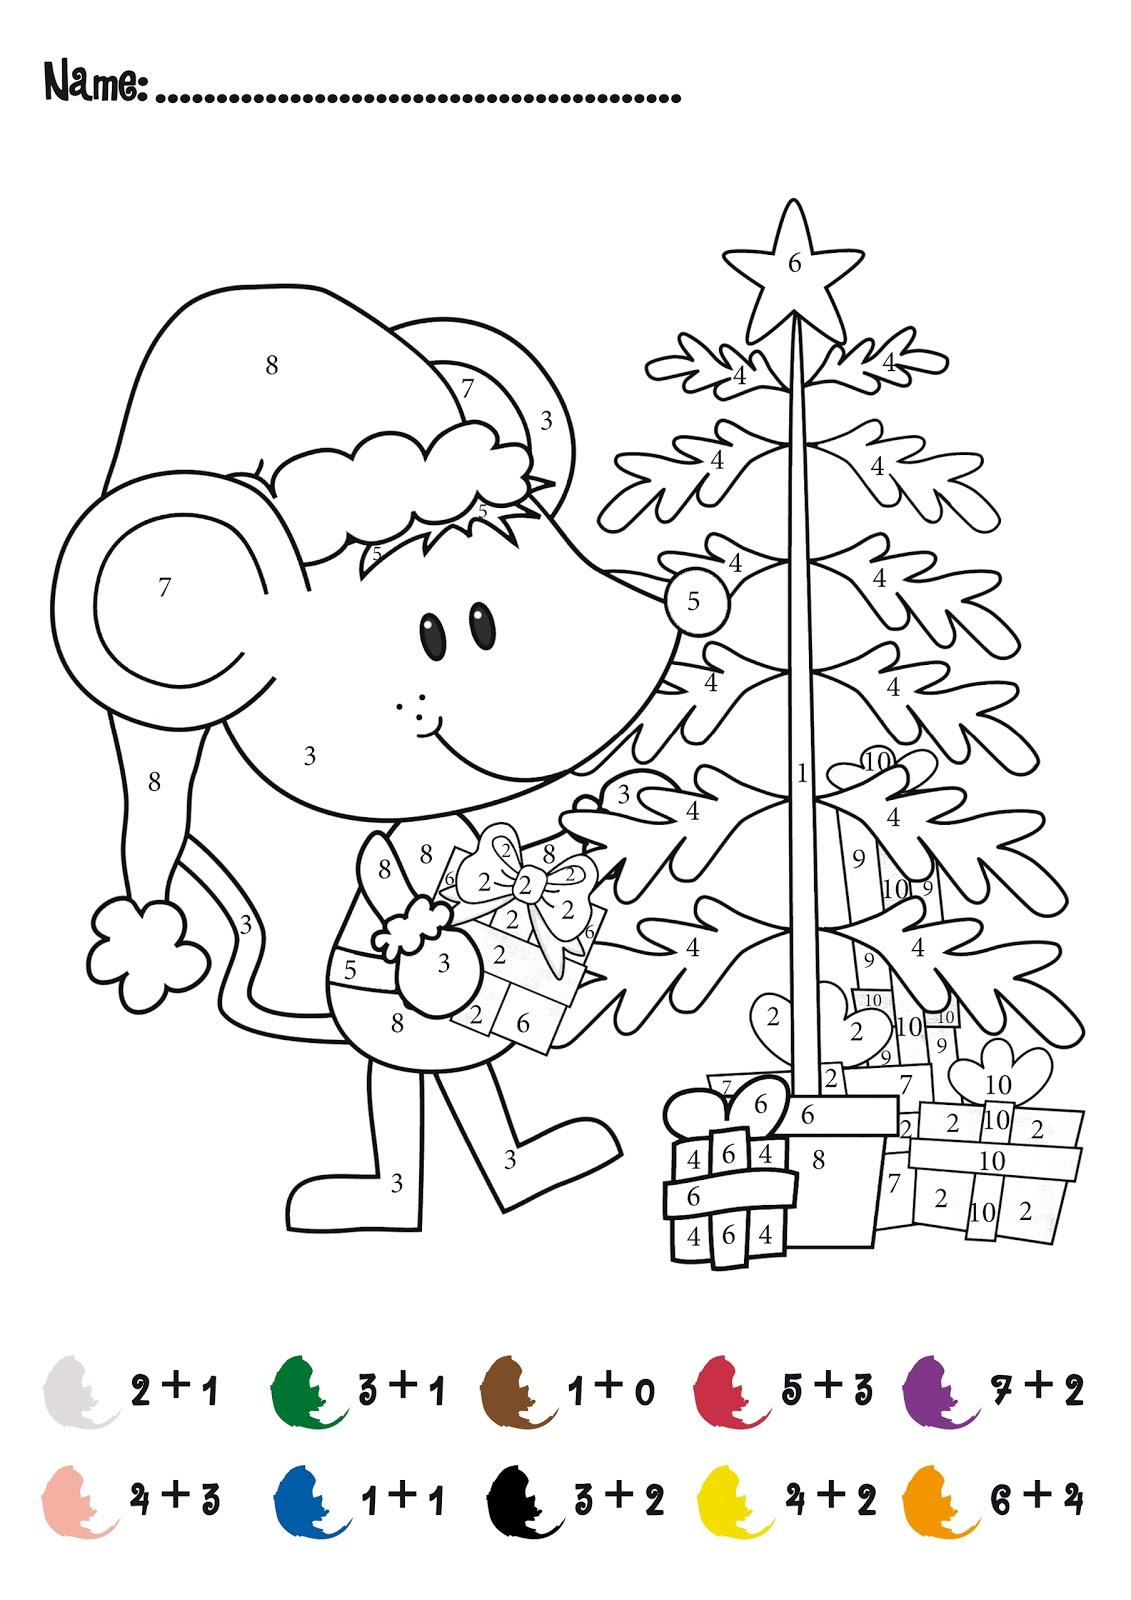 Kindergarten Worksheets Tlsbooks Com Berita Baru dot Info – Tlsbooks Kindergarten Worksheets